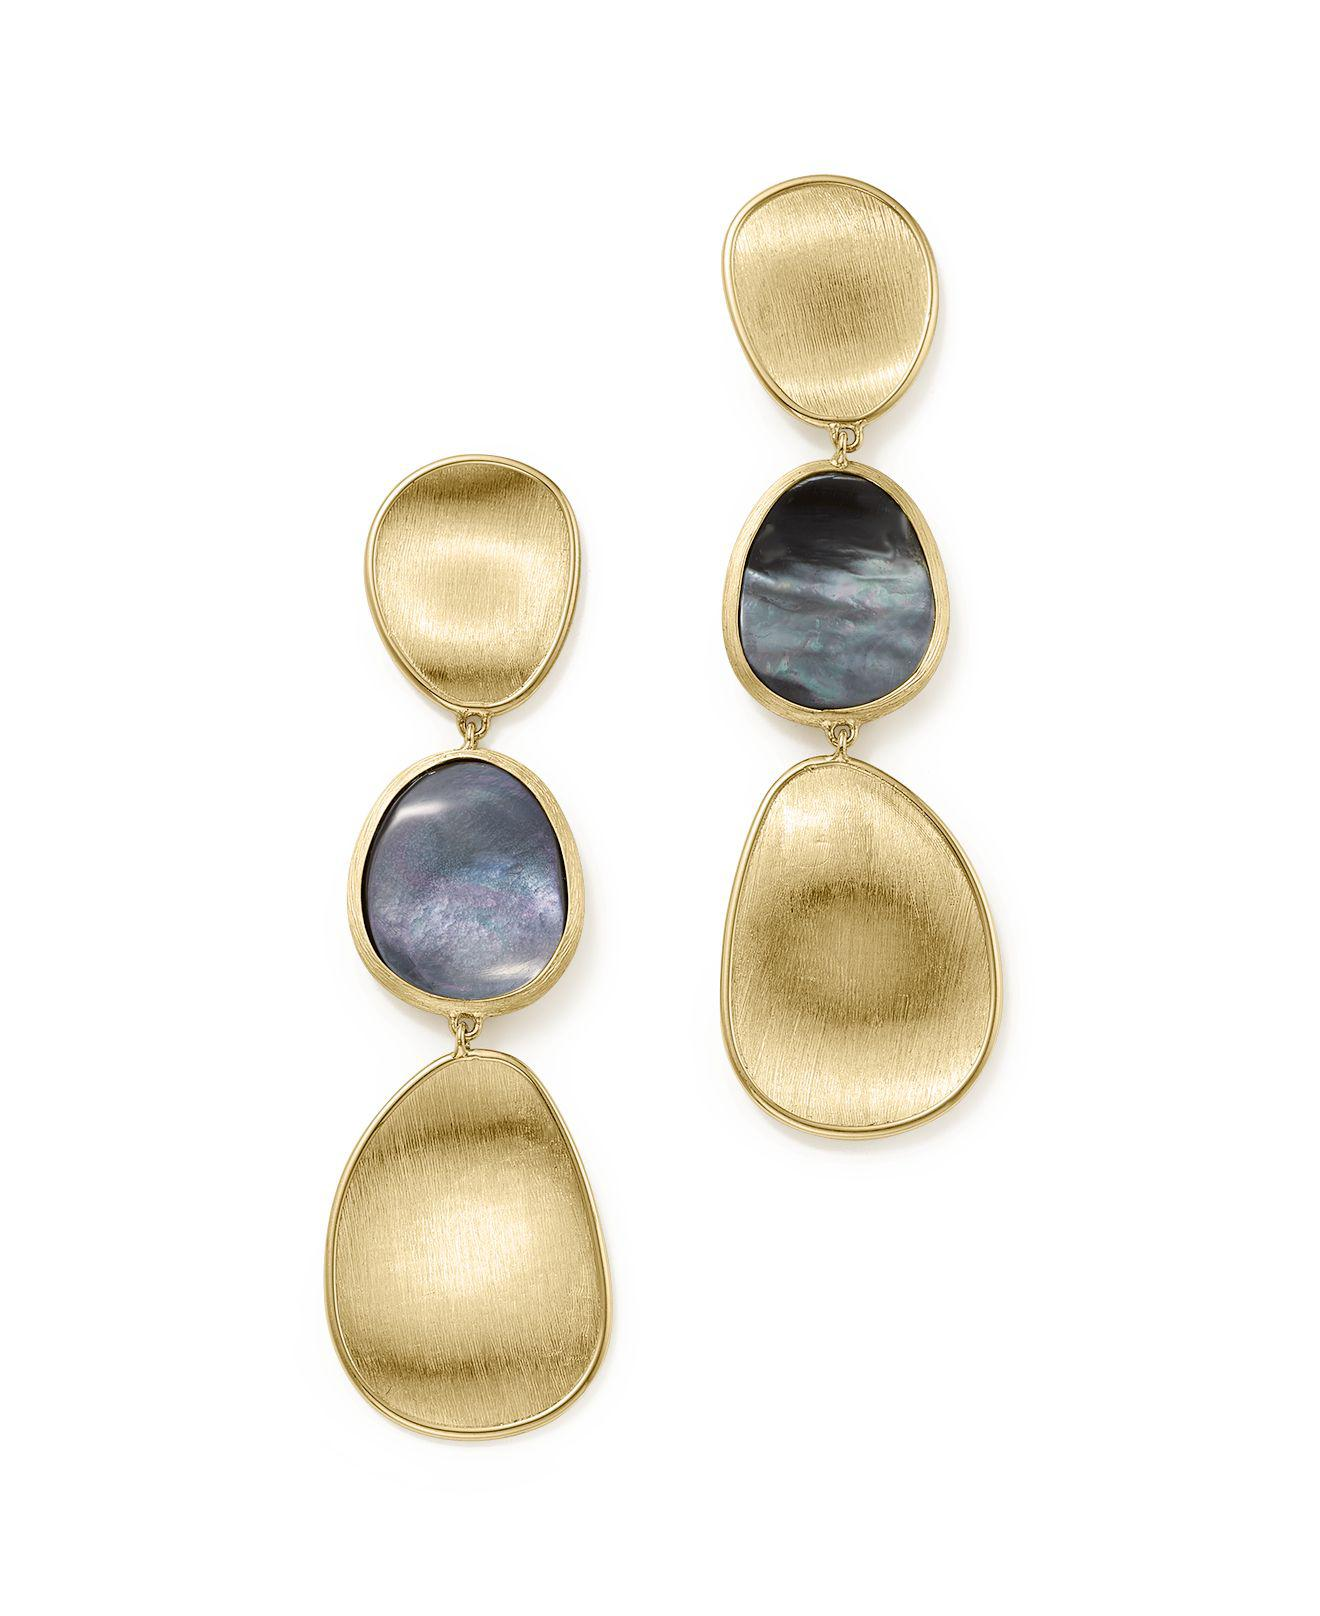 Marco Bicego Lunaria 18K Gold Drop Earrings MTh3vmrJW